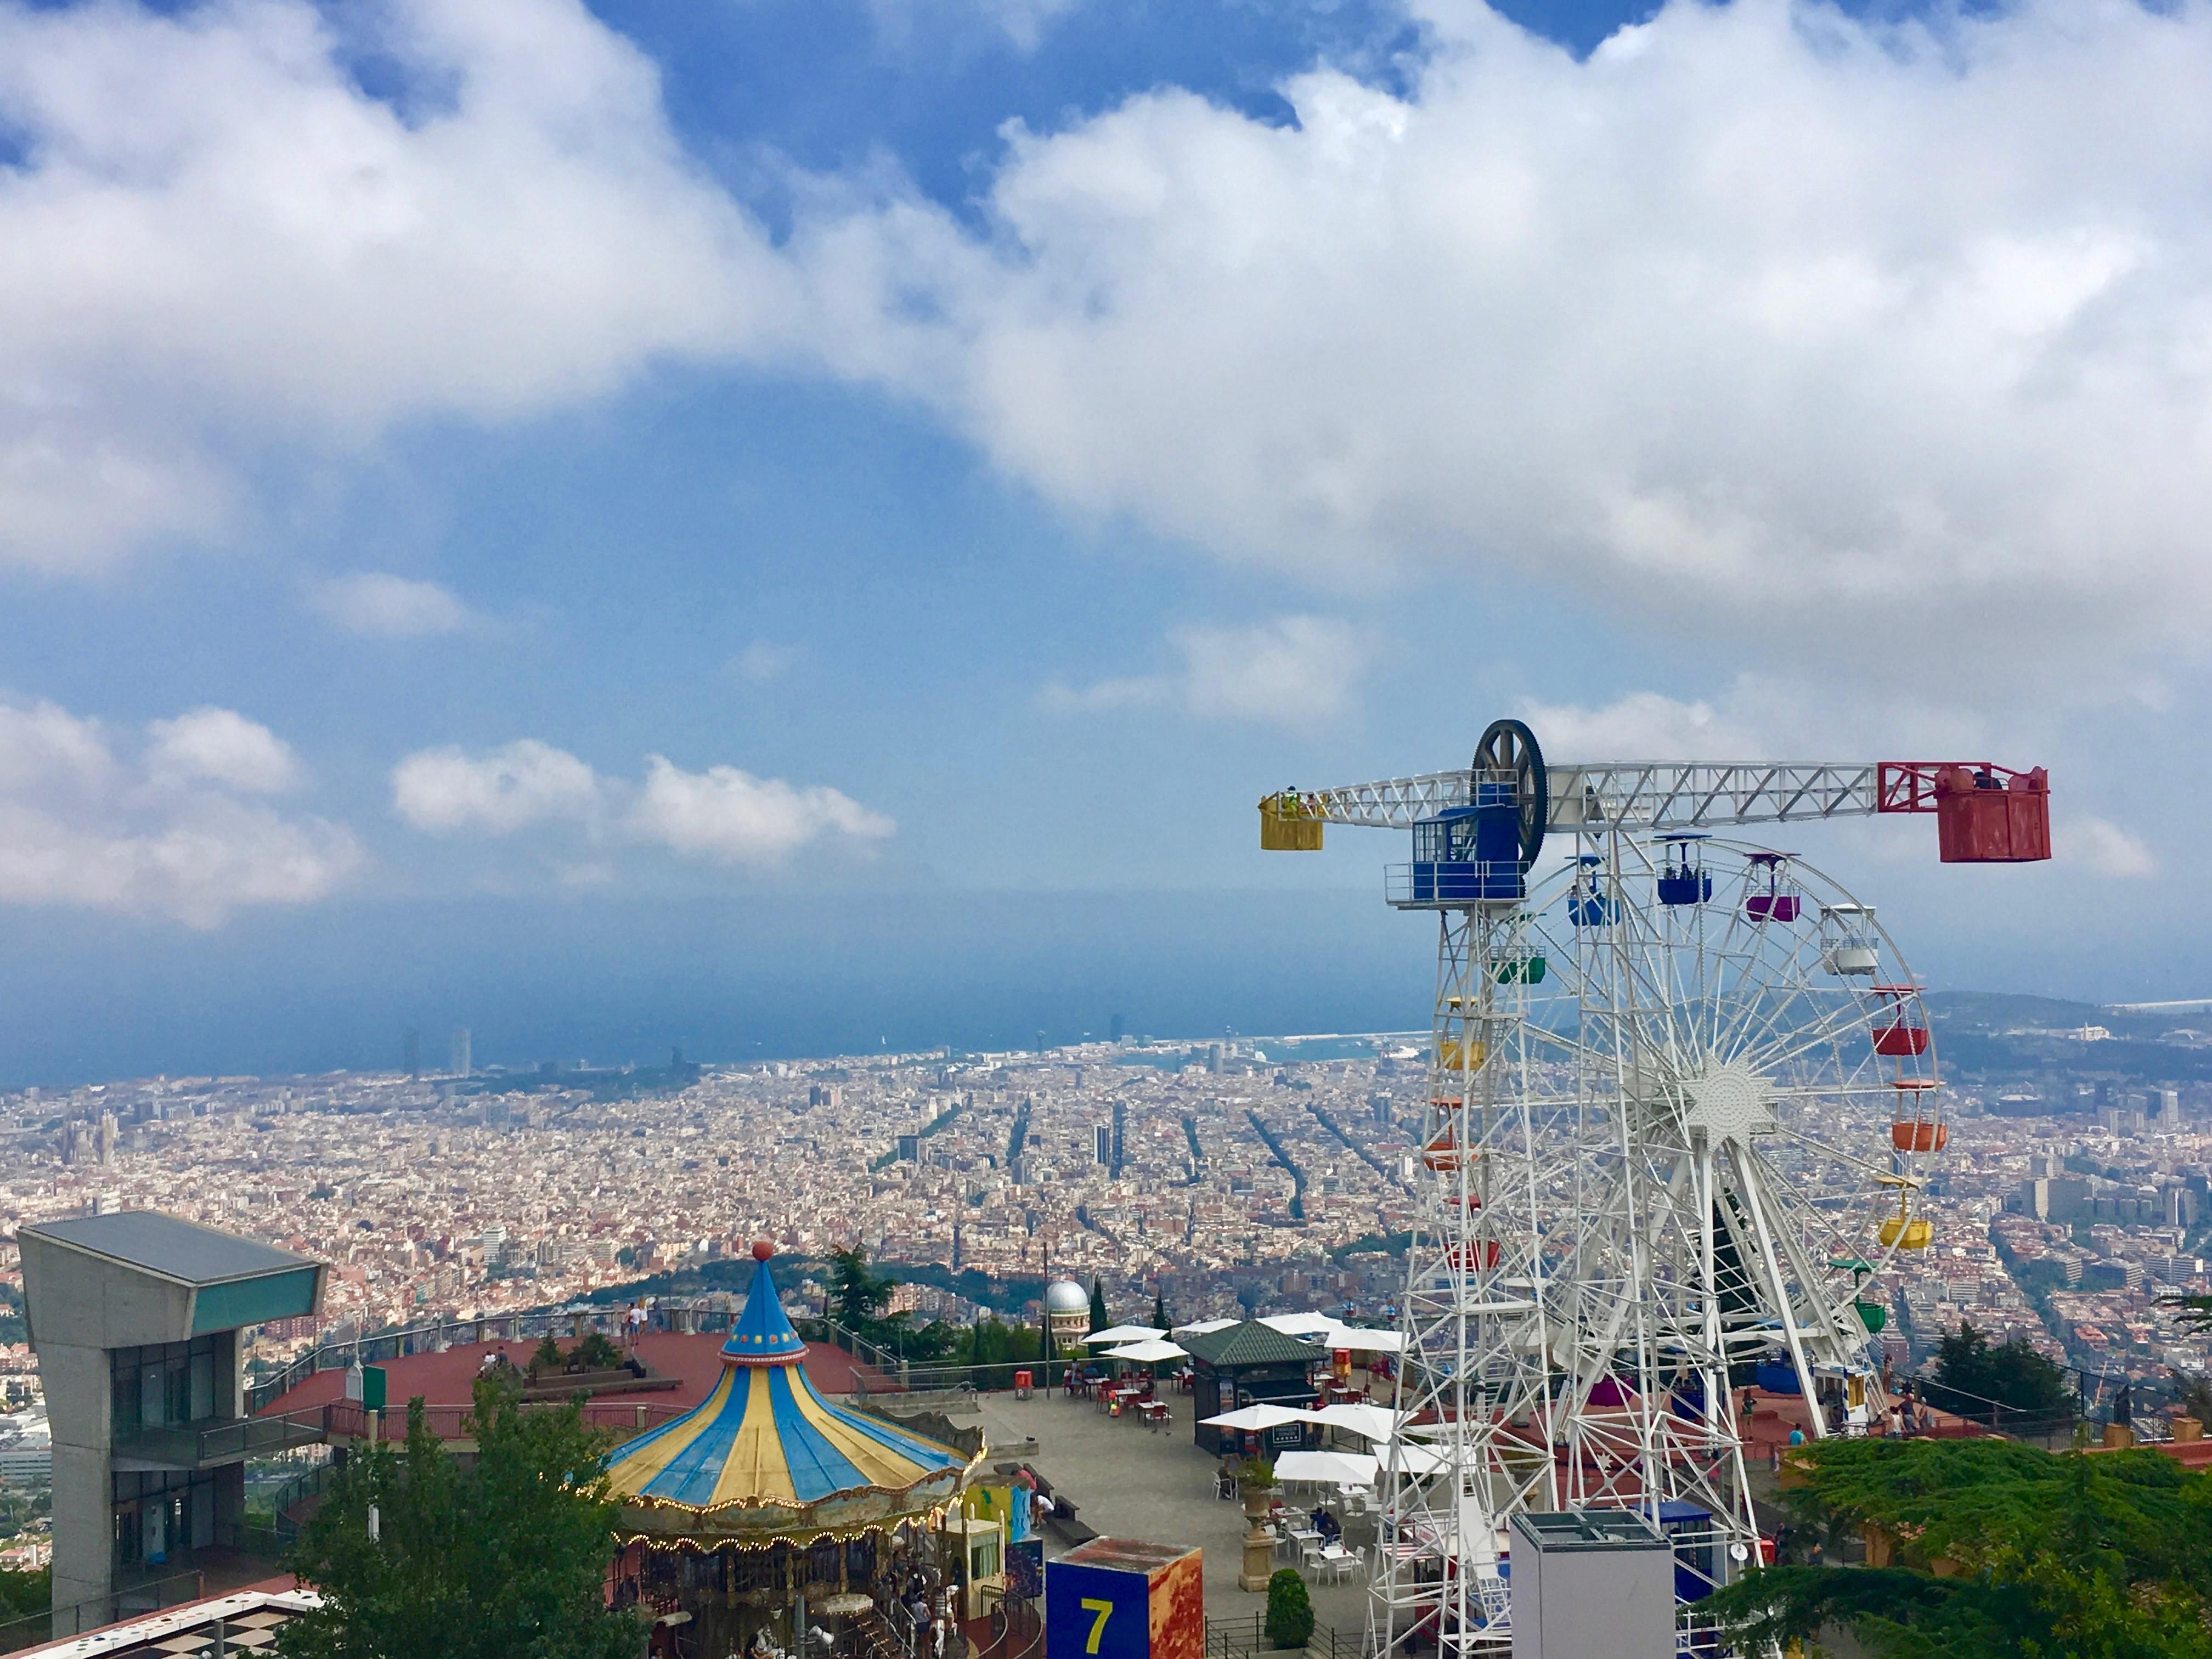 Tibidabo, Theme Park, Barcelona, All Year